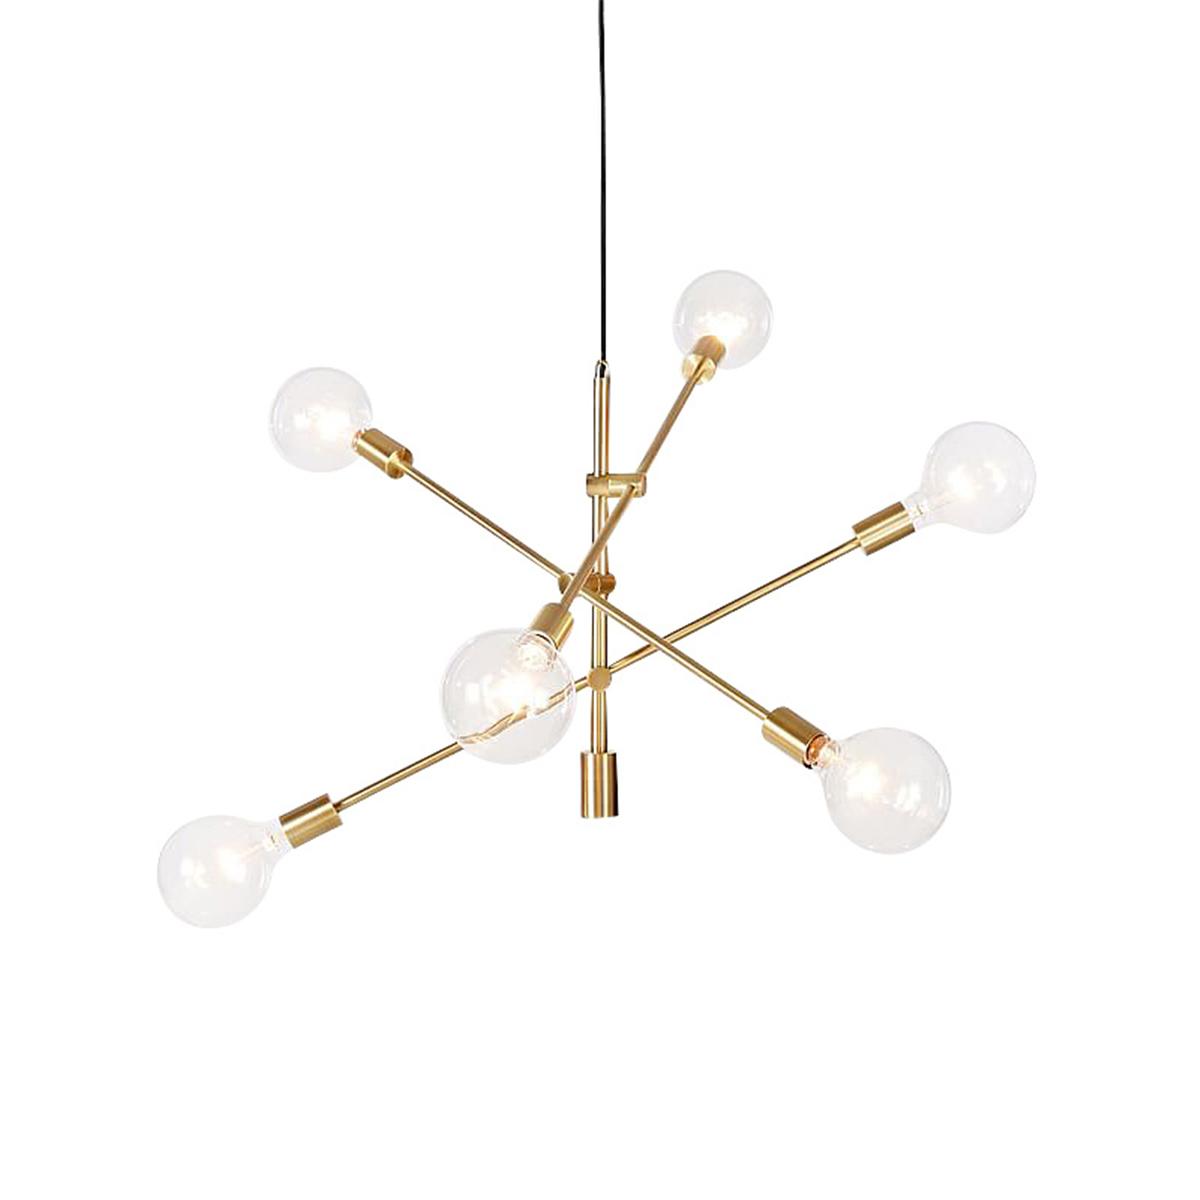 Modern chandeliers 6 lights pendant lamp industrial metal ceiling modern chandeliers 6 lights pendant lamp industrial metal aloadofball Choice Image